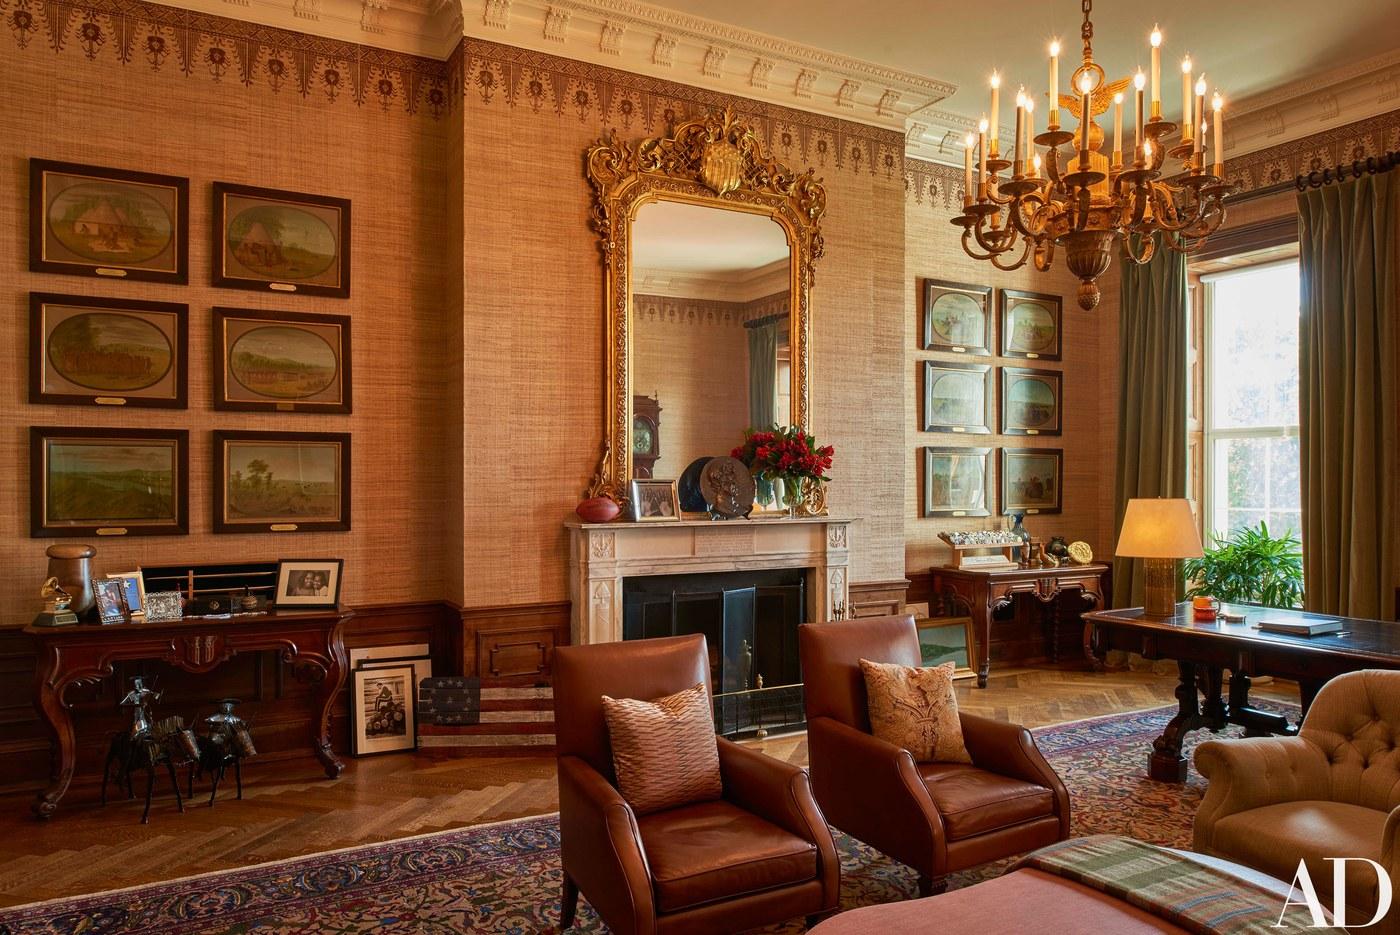 The Obama family's residence inside the White House